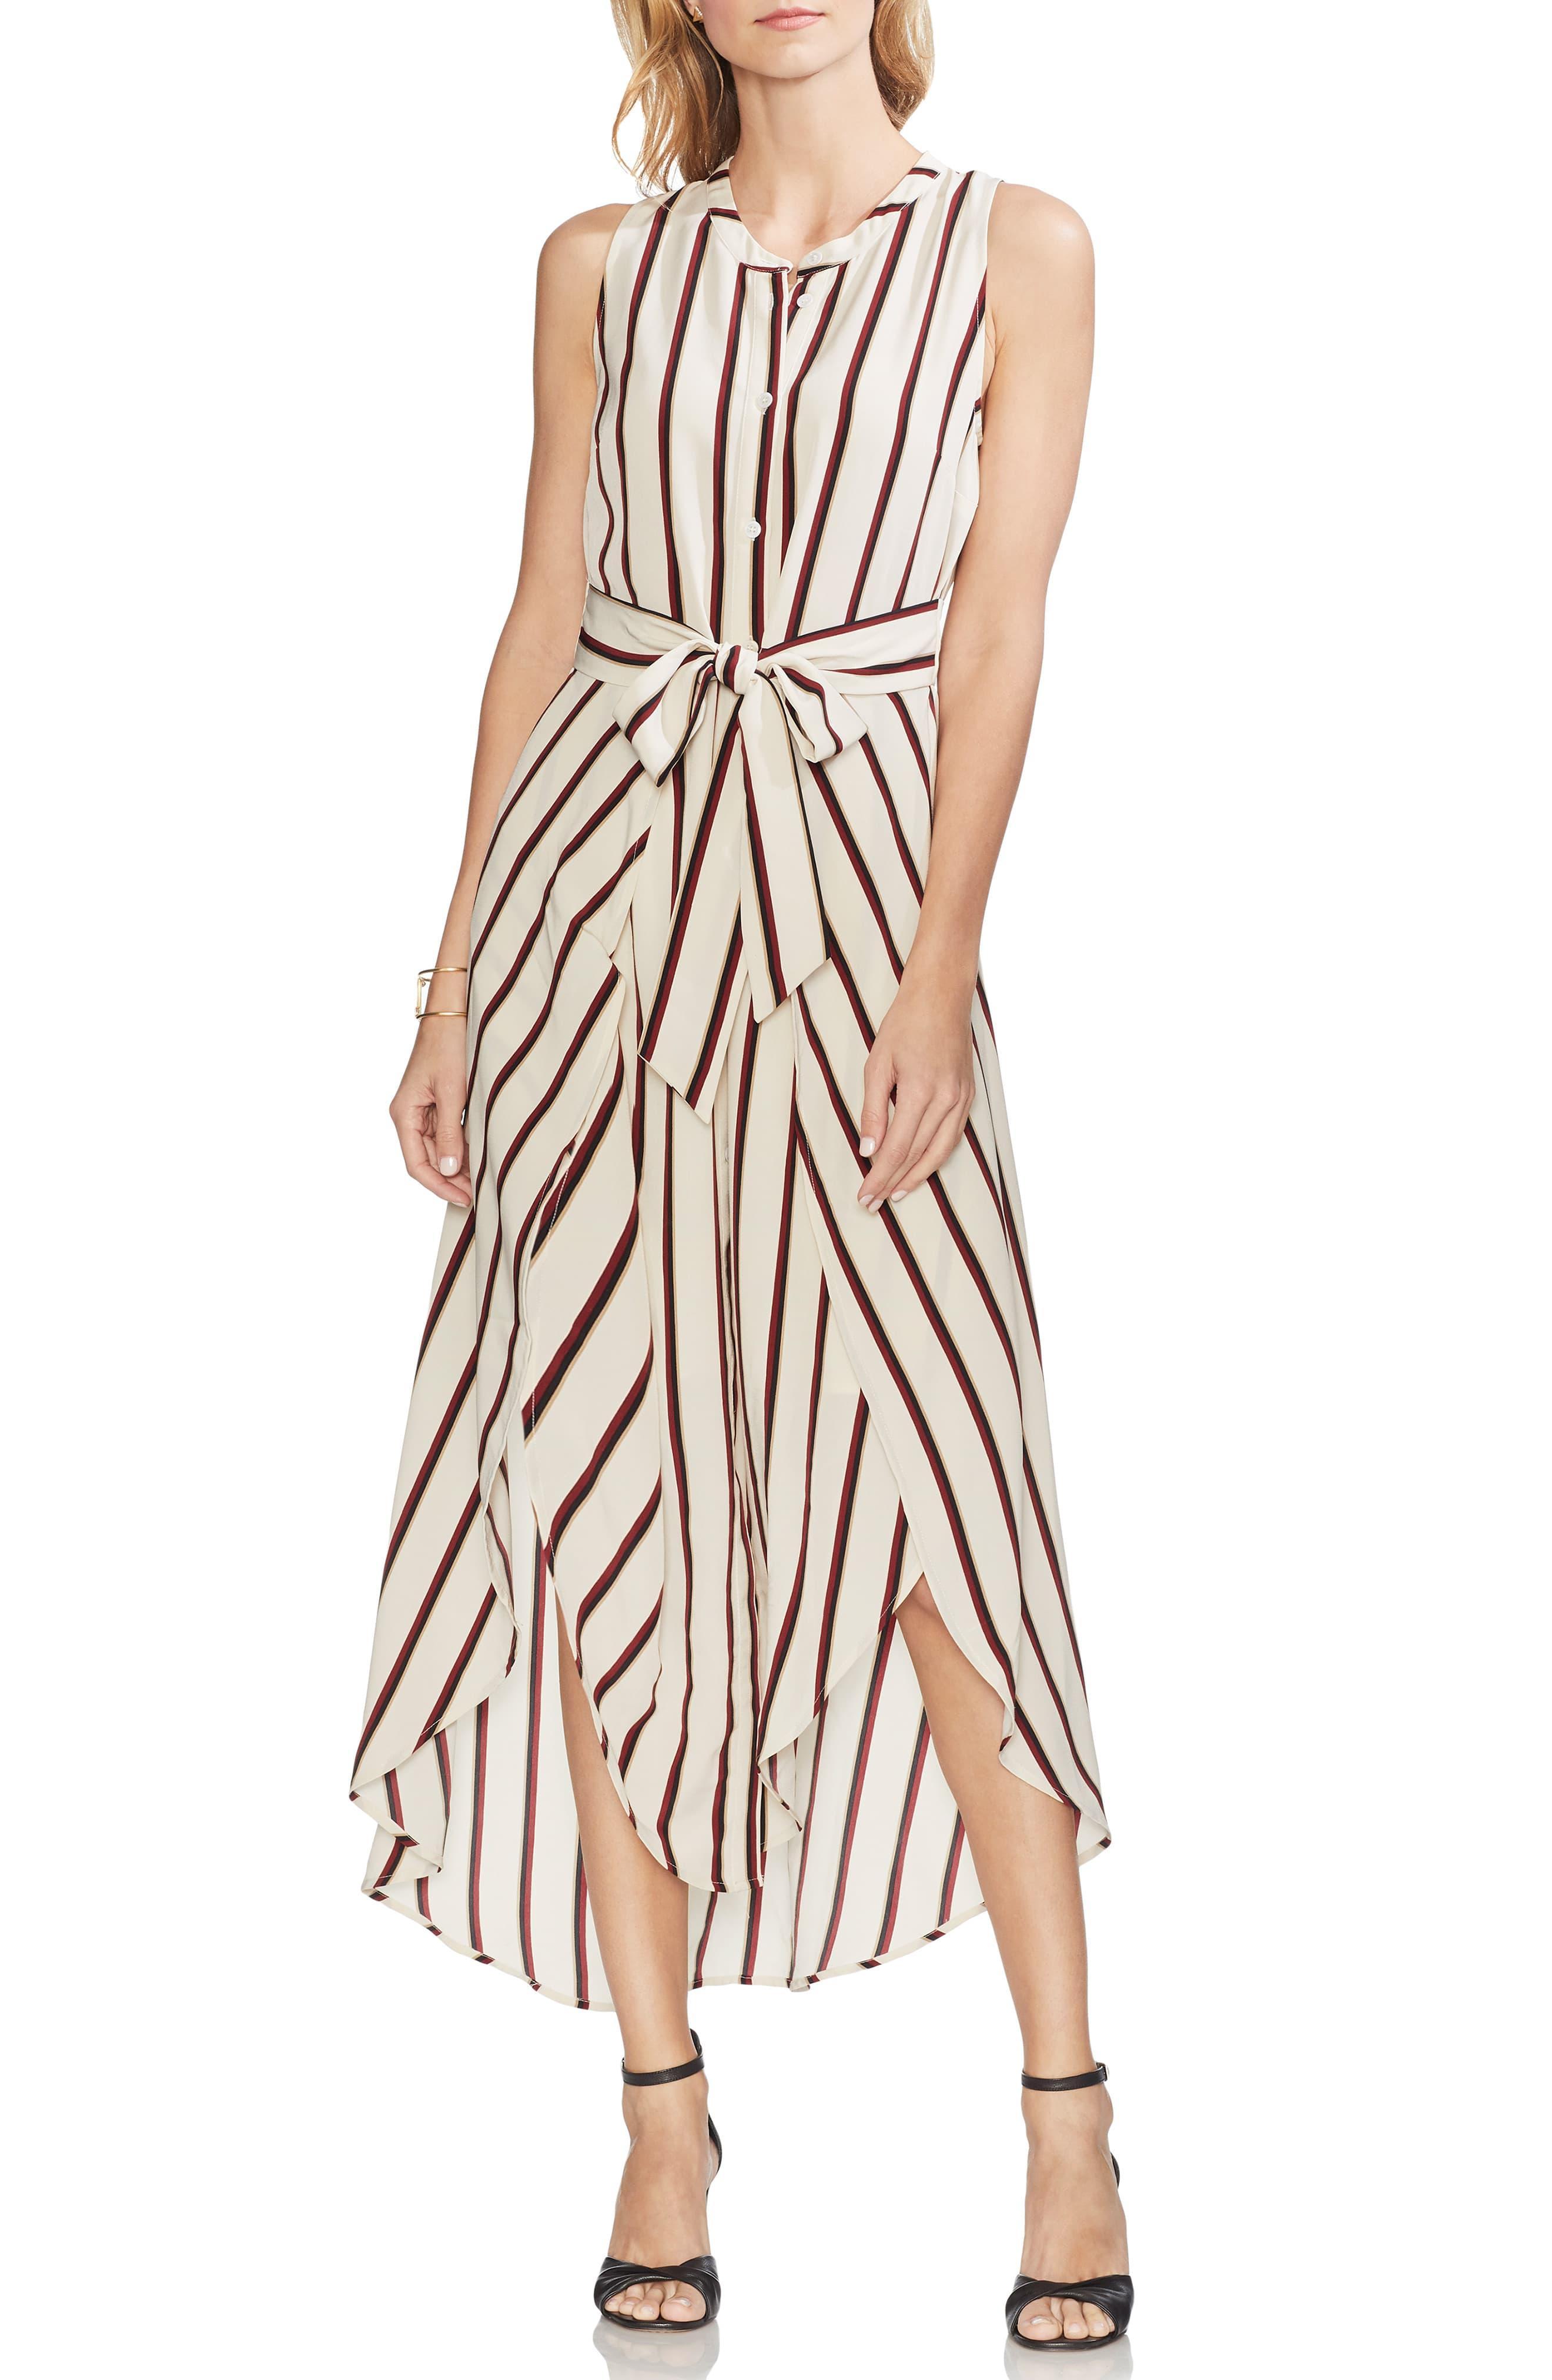 3c9f3784e80 Vince Camuto Caravan Stripe Maxi Dress - Save 47% - Lyst